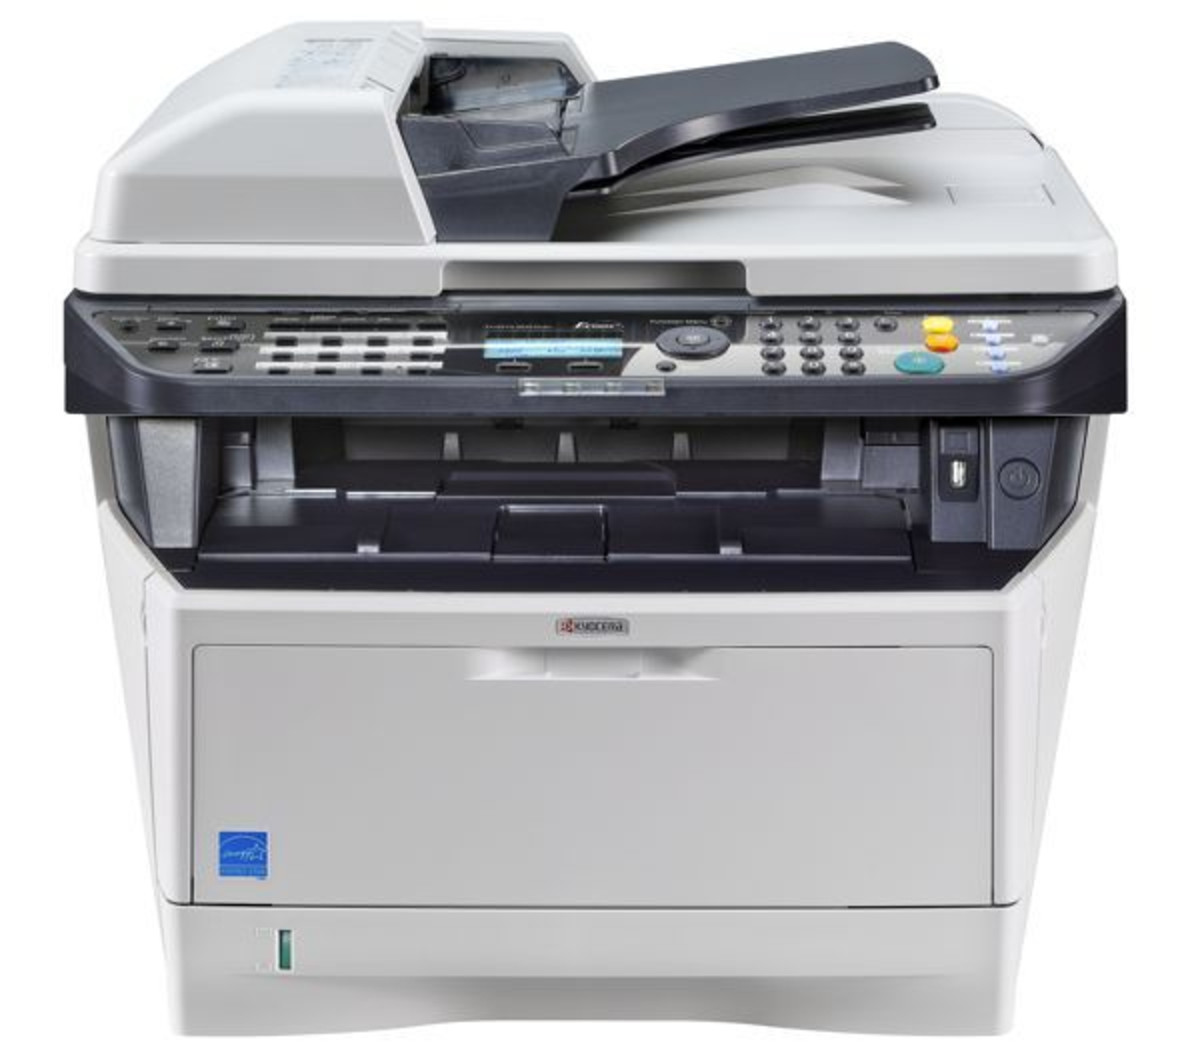 Kyocera ECOSYS M2535dn Mono Laser Printer